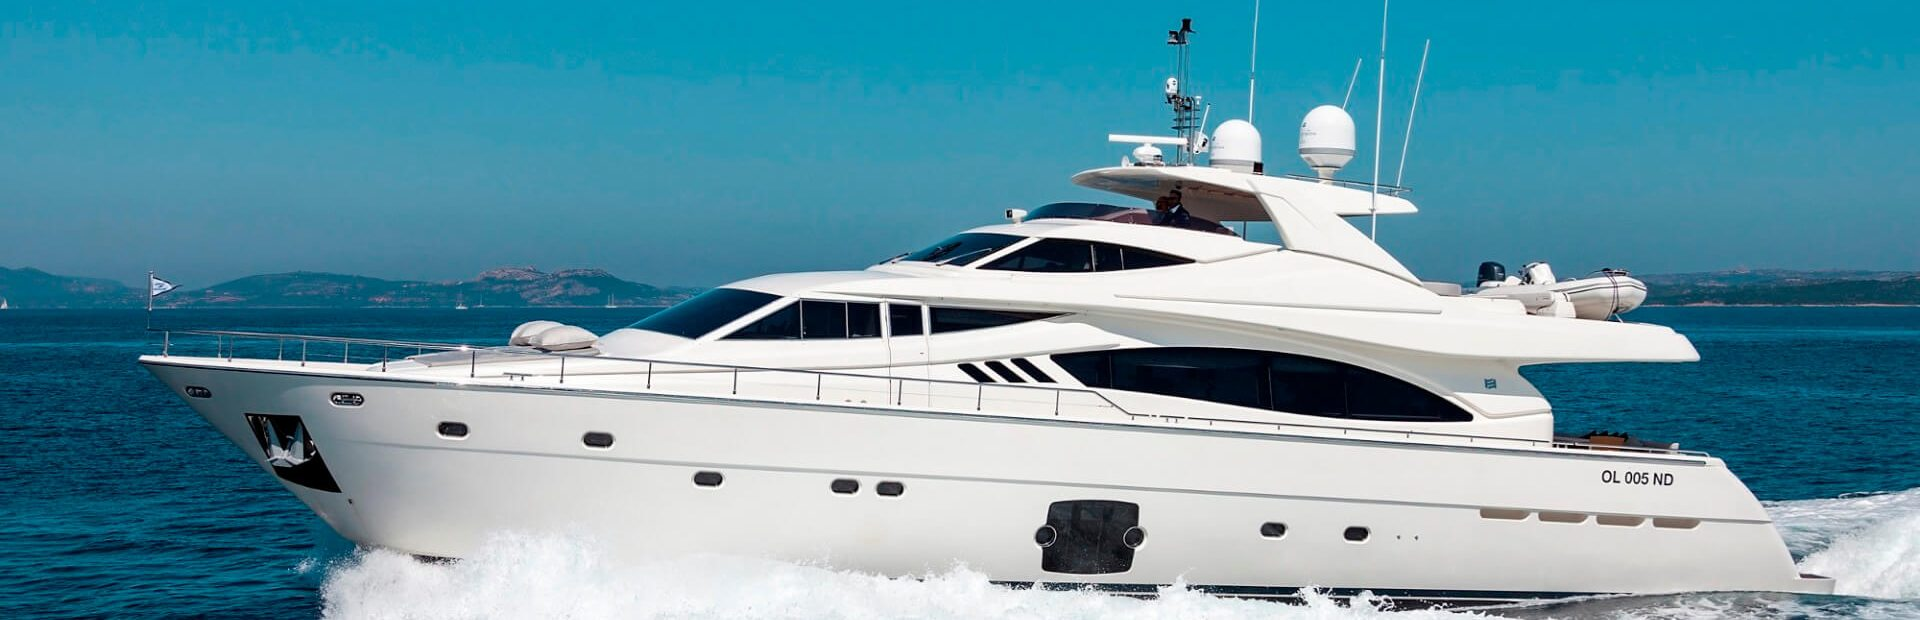 Ferretti Yachts 881 RPH Yacht Charter